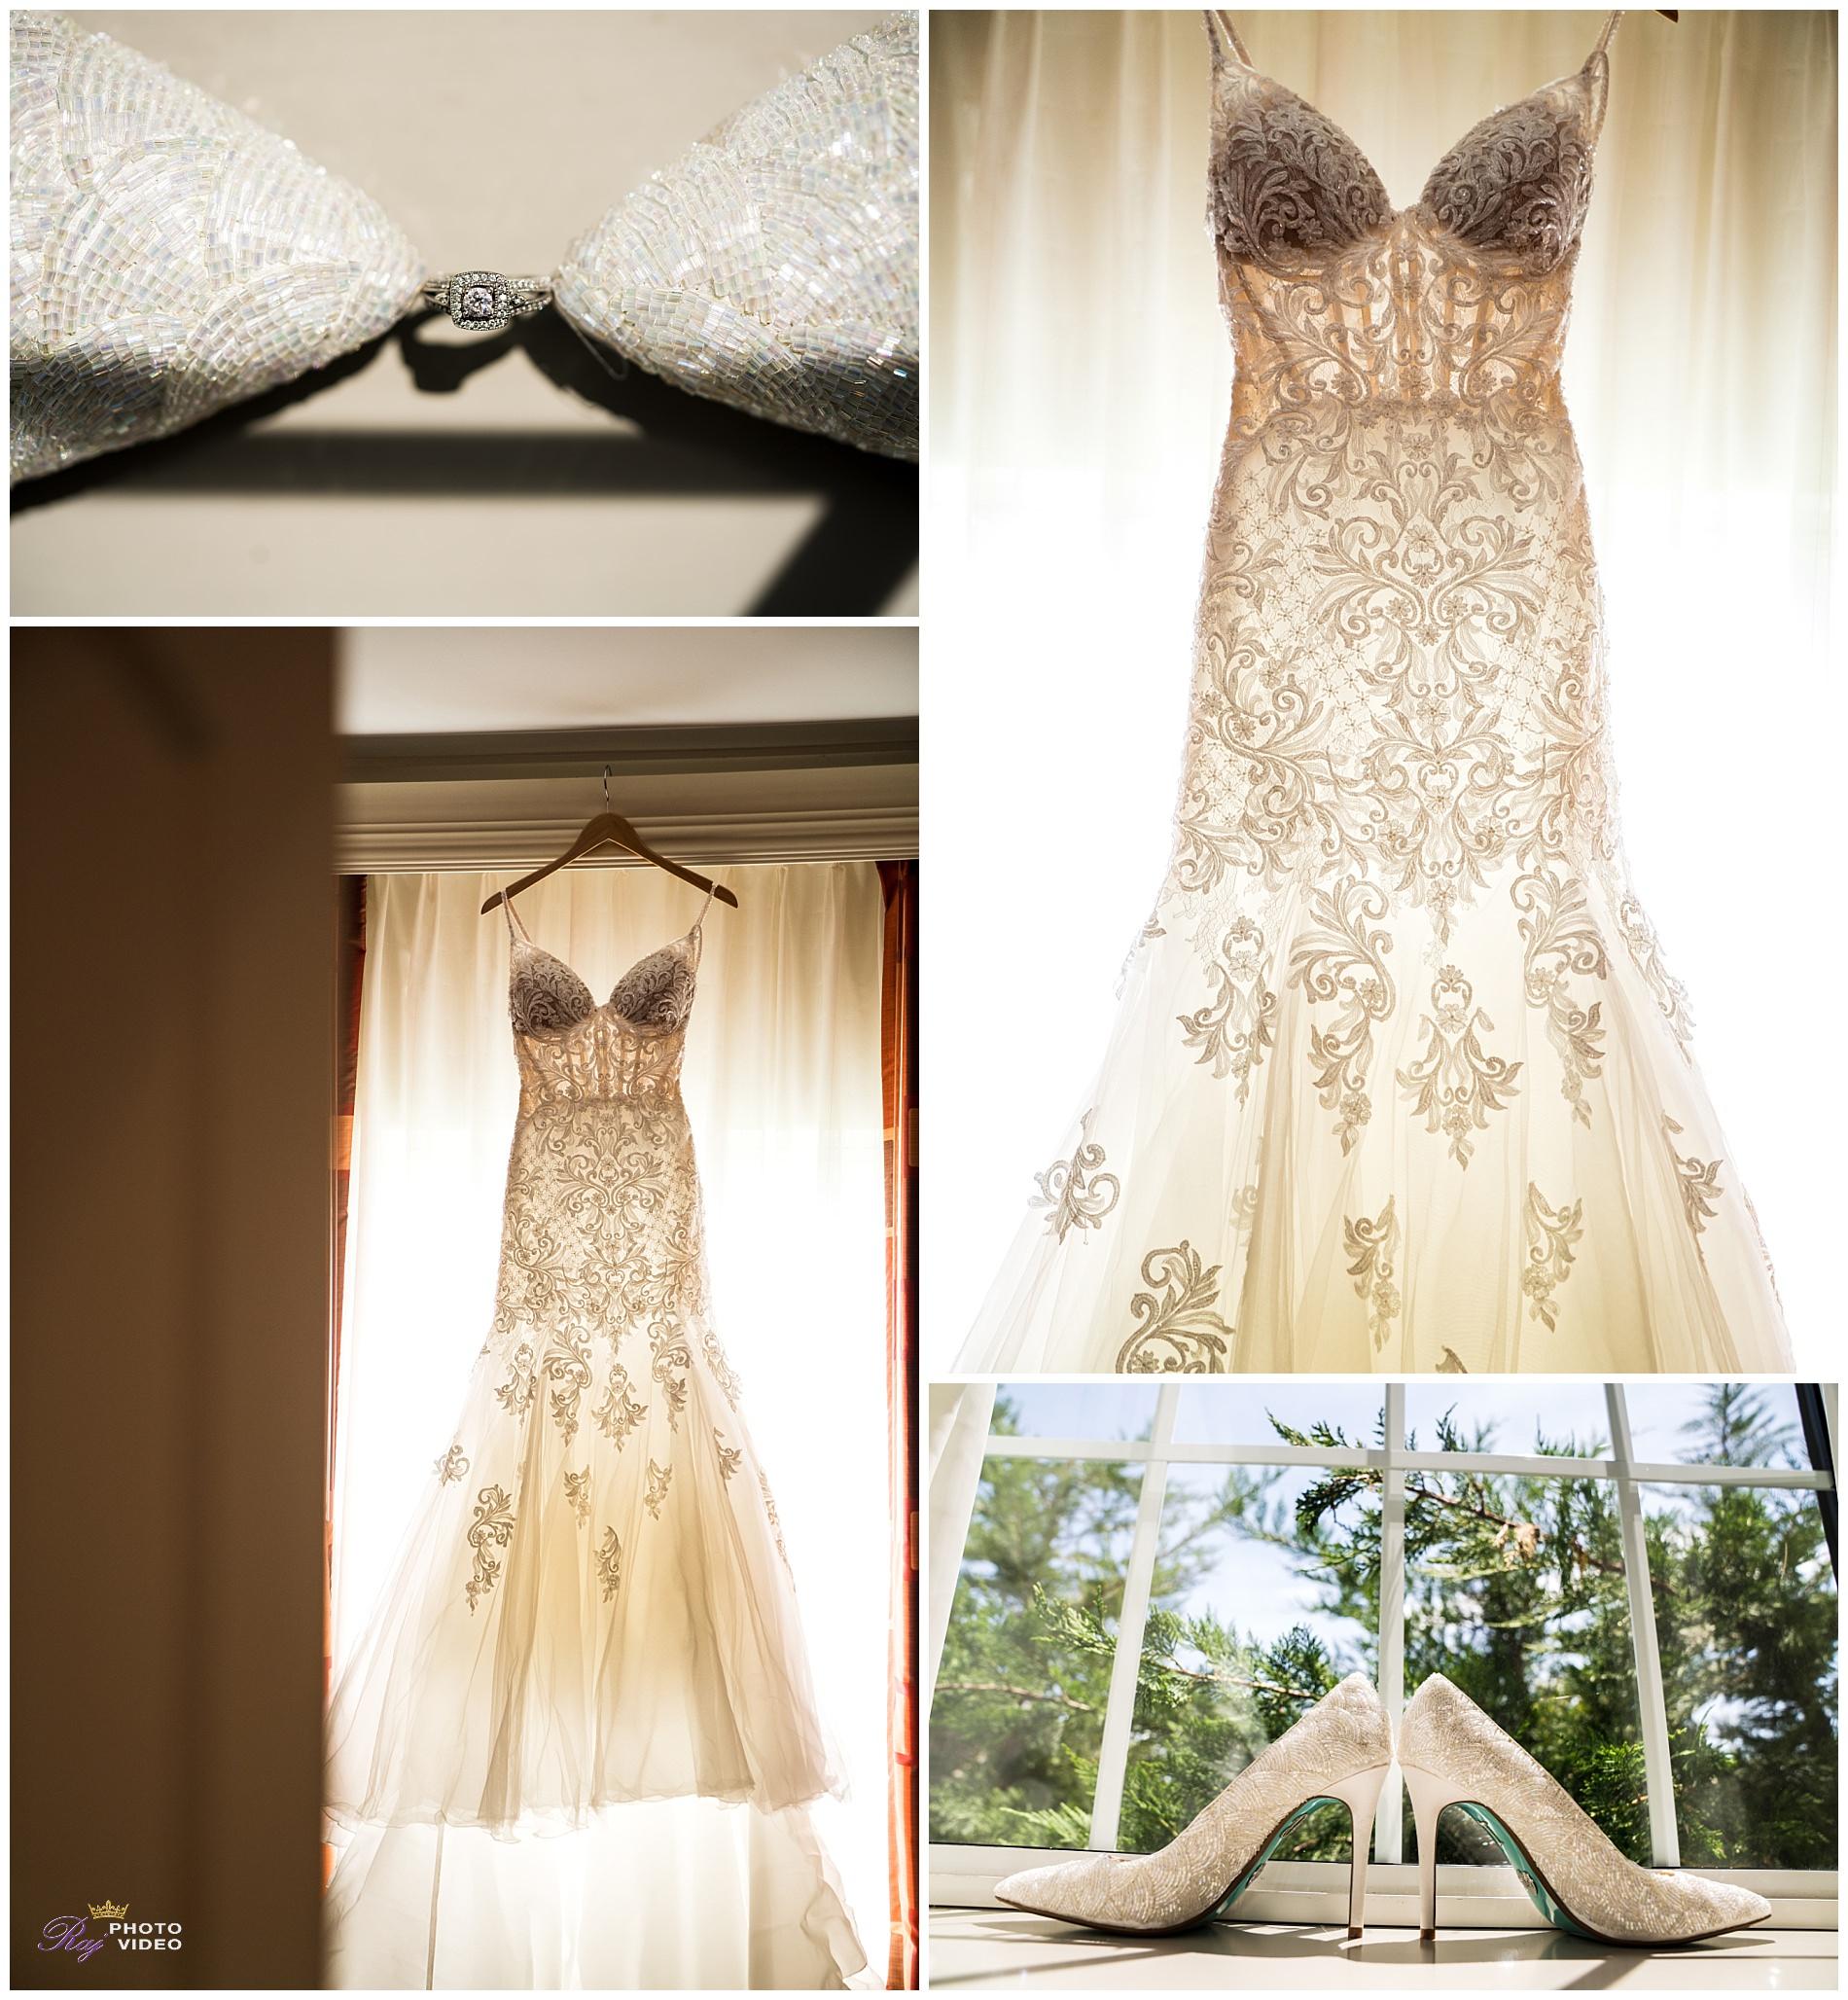 Wilshire-Grand-Hotel-West-Orange-NJ-Bridal-Preparation-Yanet-Jose-1.jpg